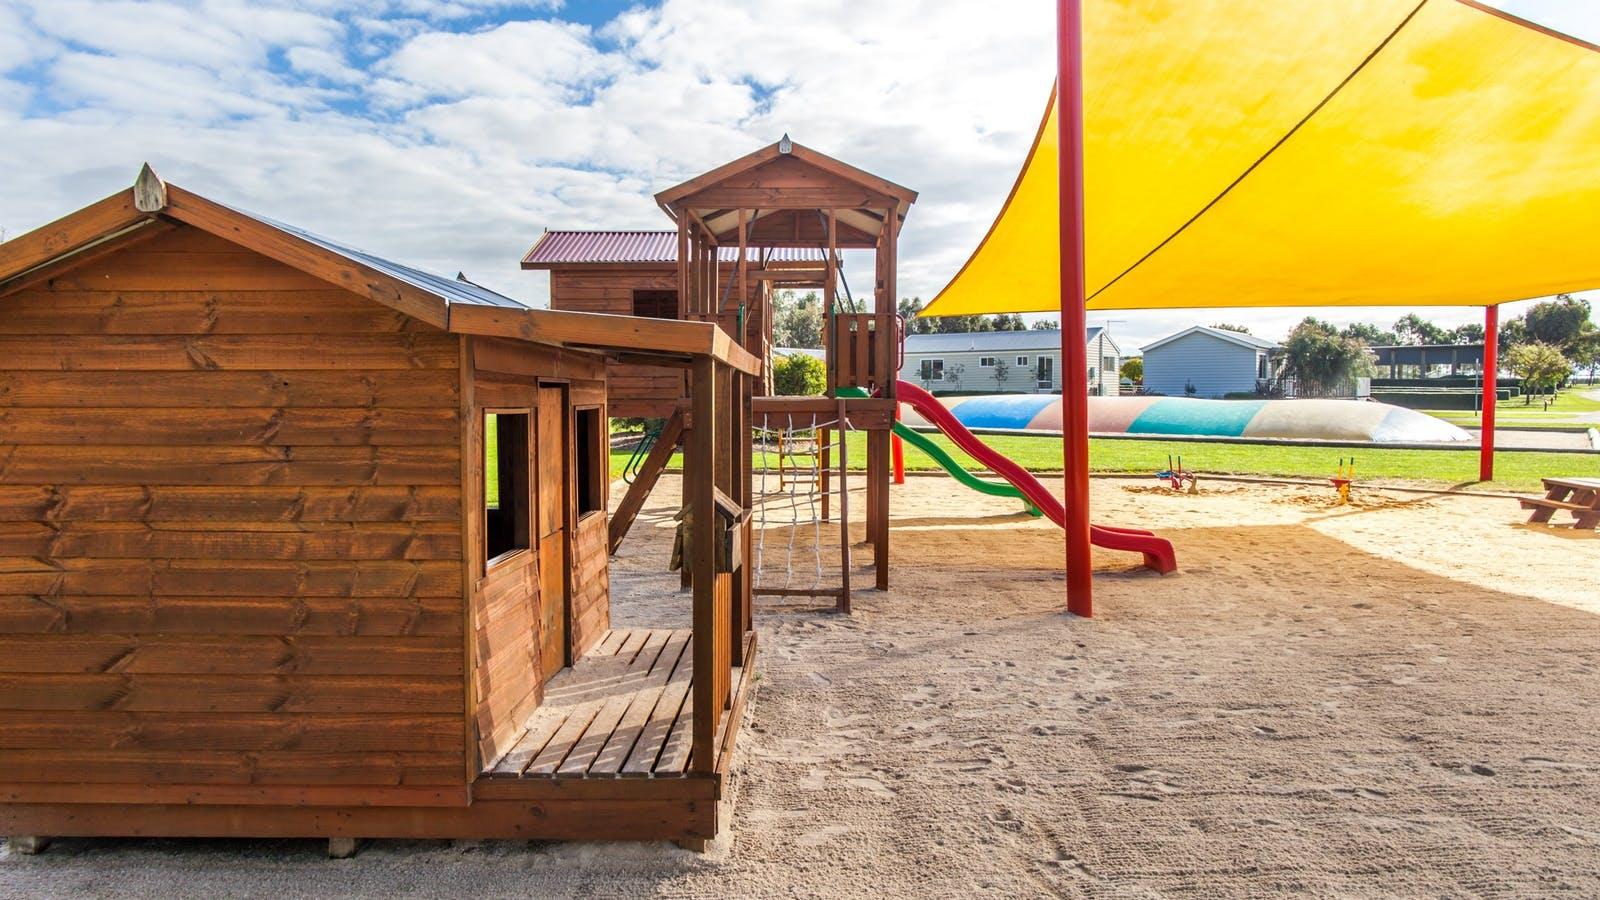 BIG4 Bellarine adventure playground